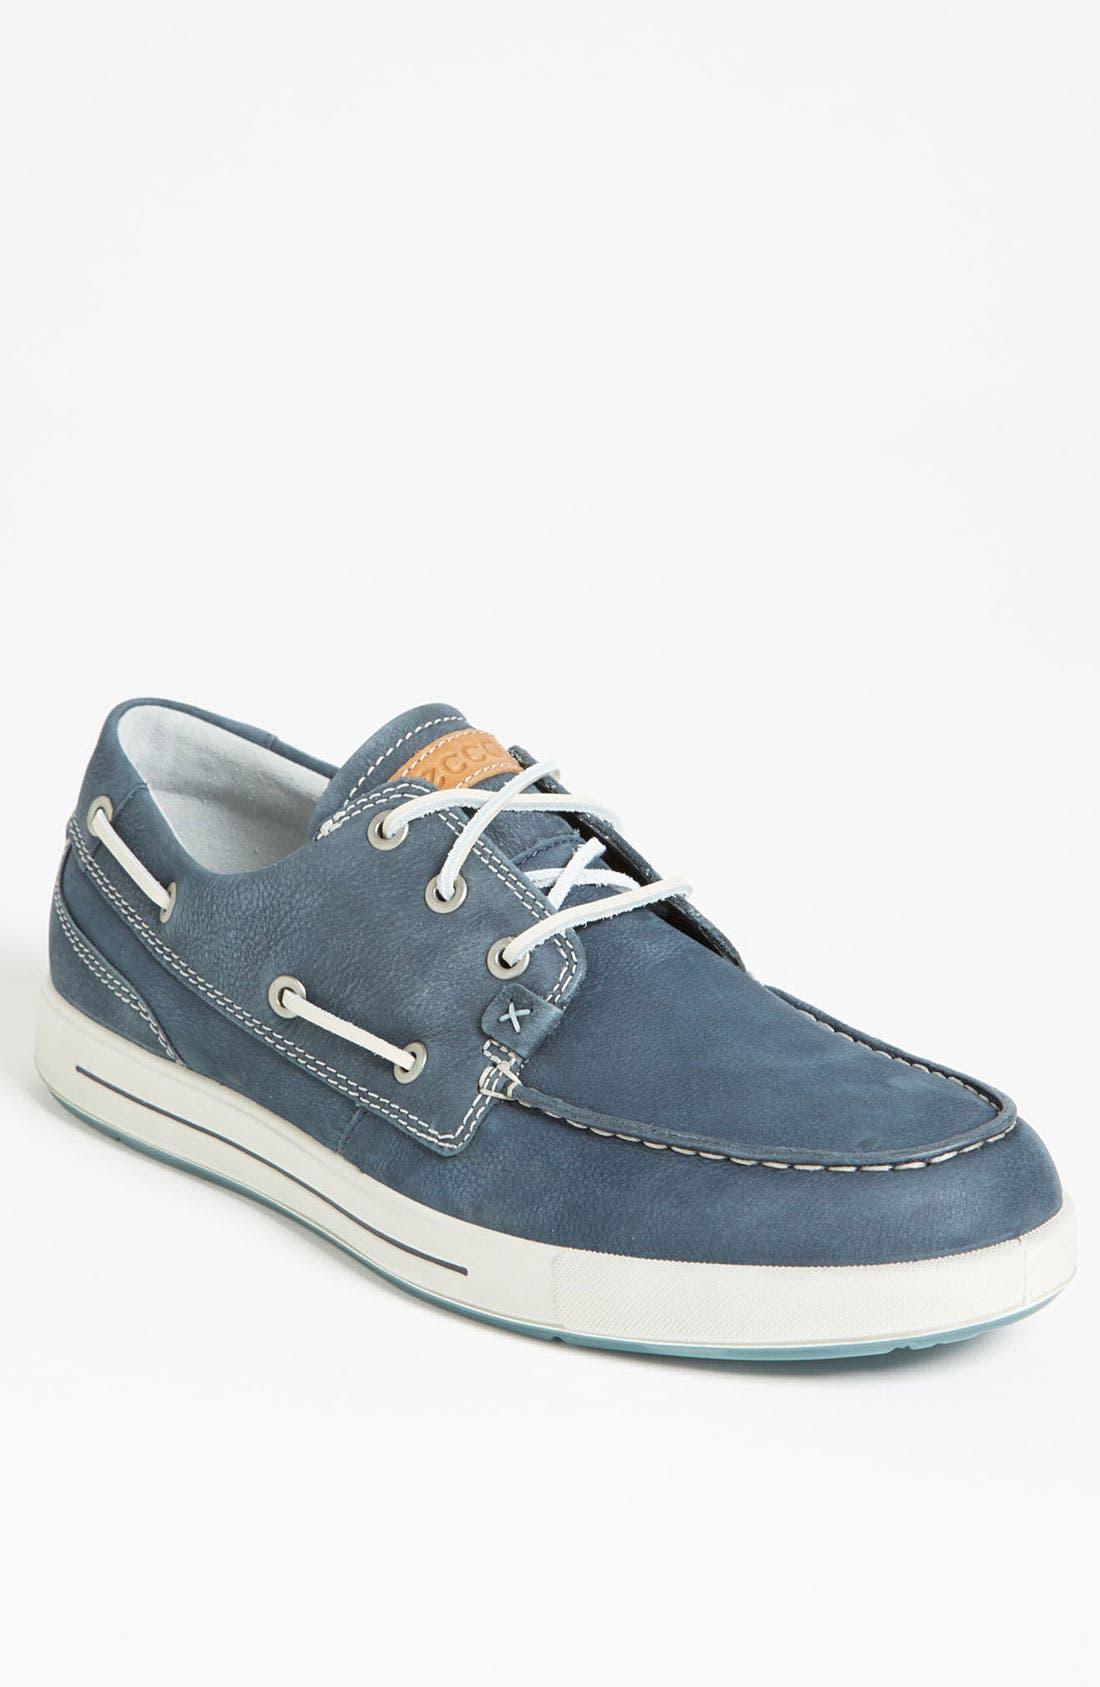 Main Image - ECCO 'Androw' Boat Shoe (Men)